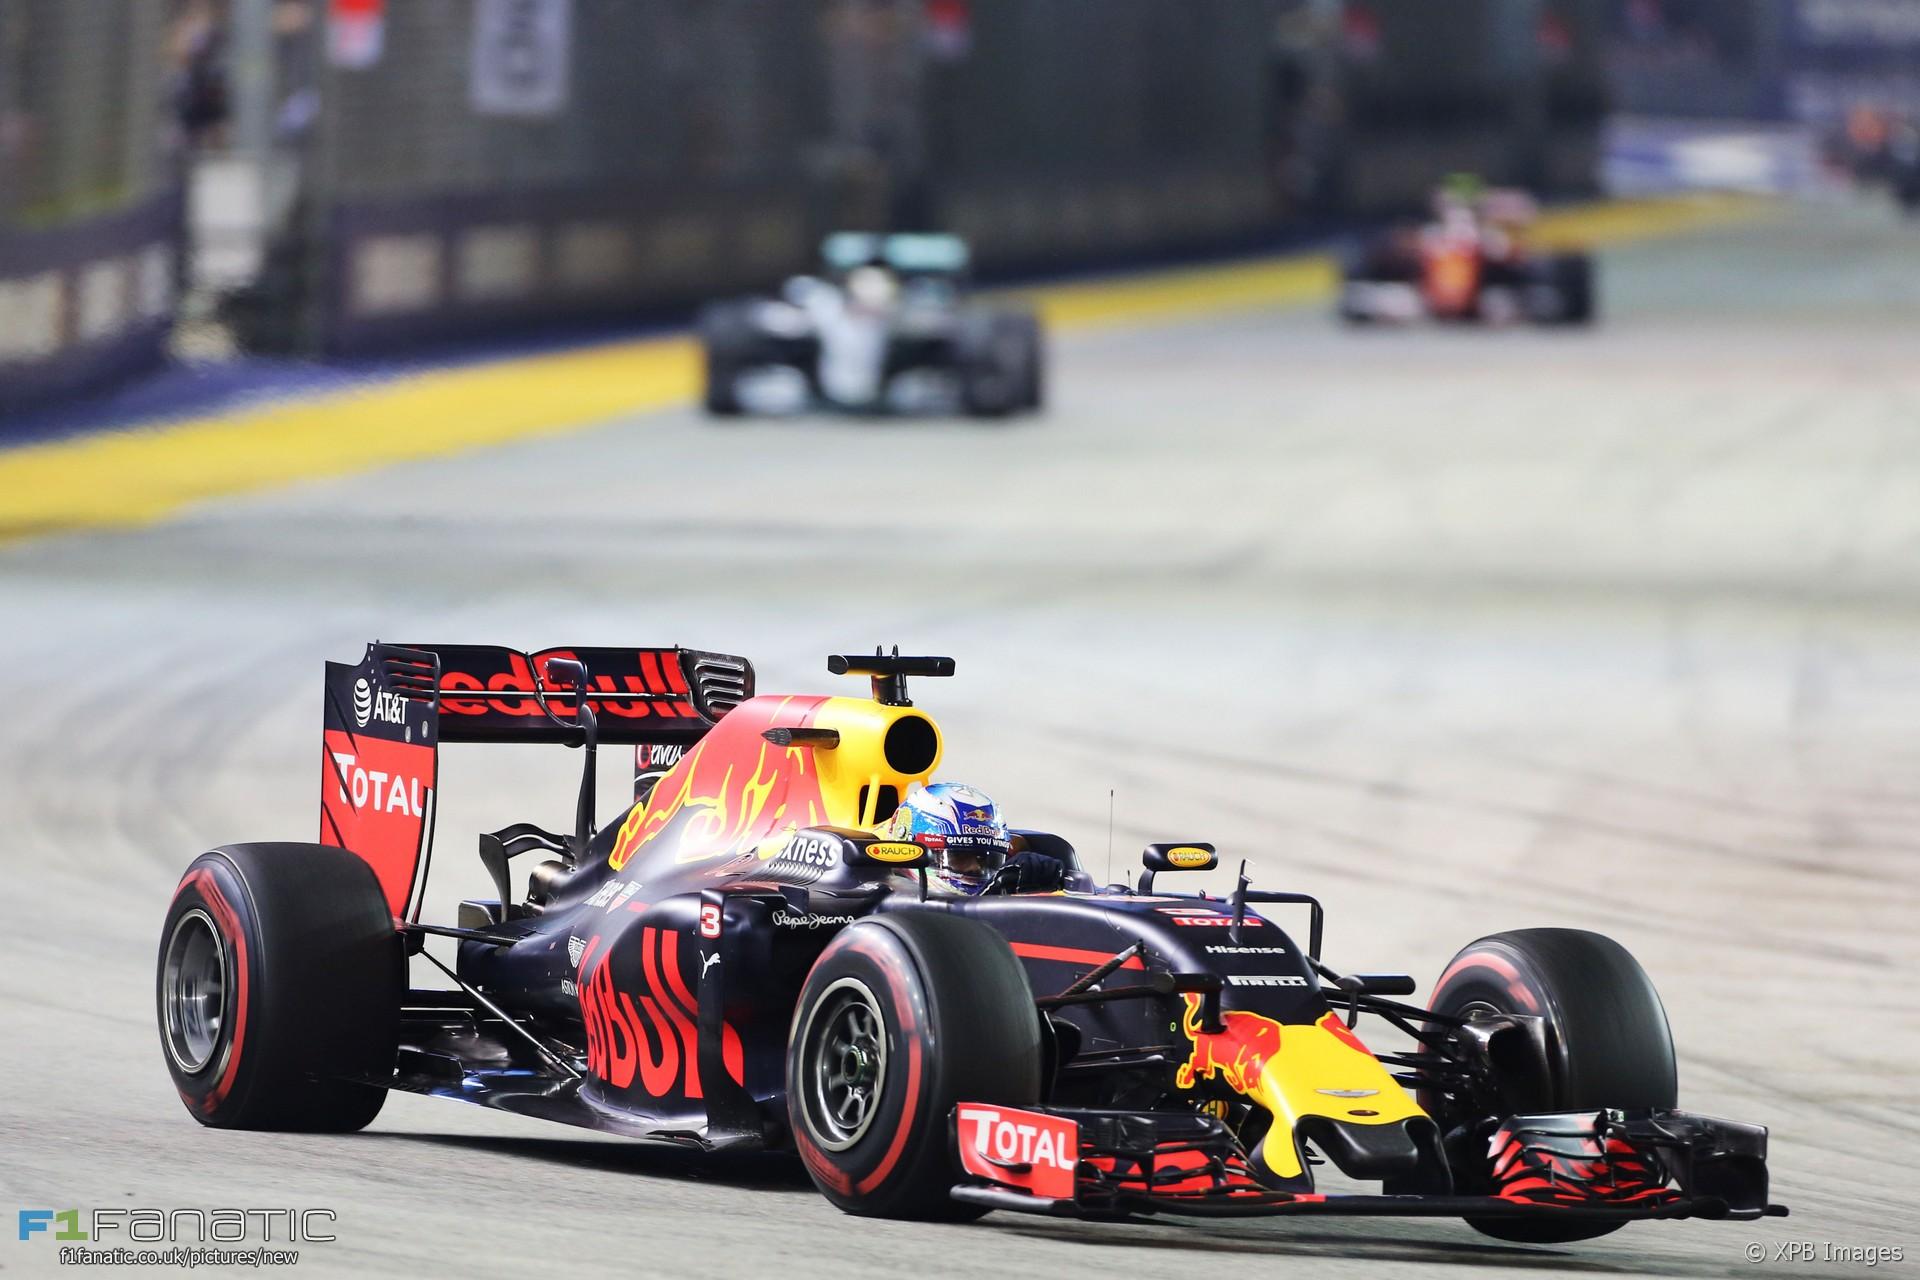 Daniel Ricciardo, Red Bull, Singapore, 2016